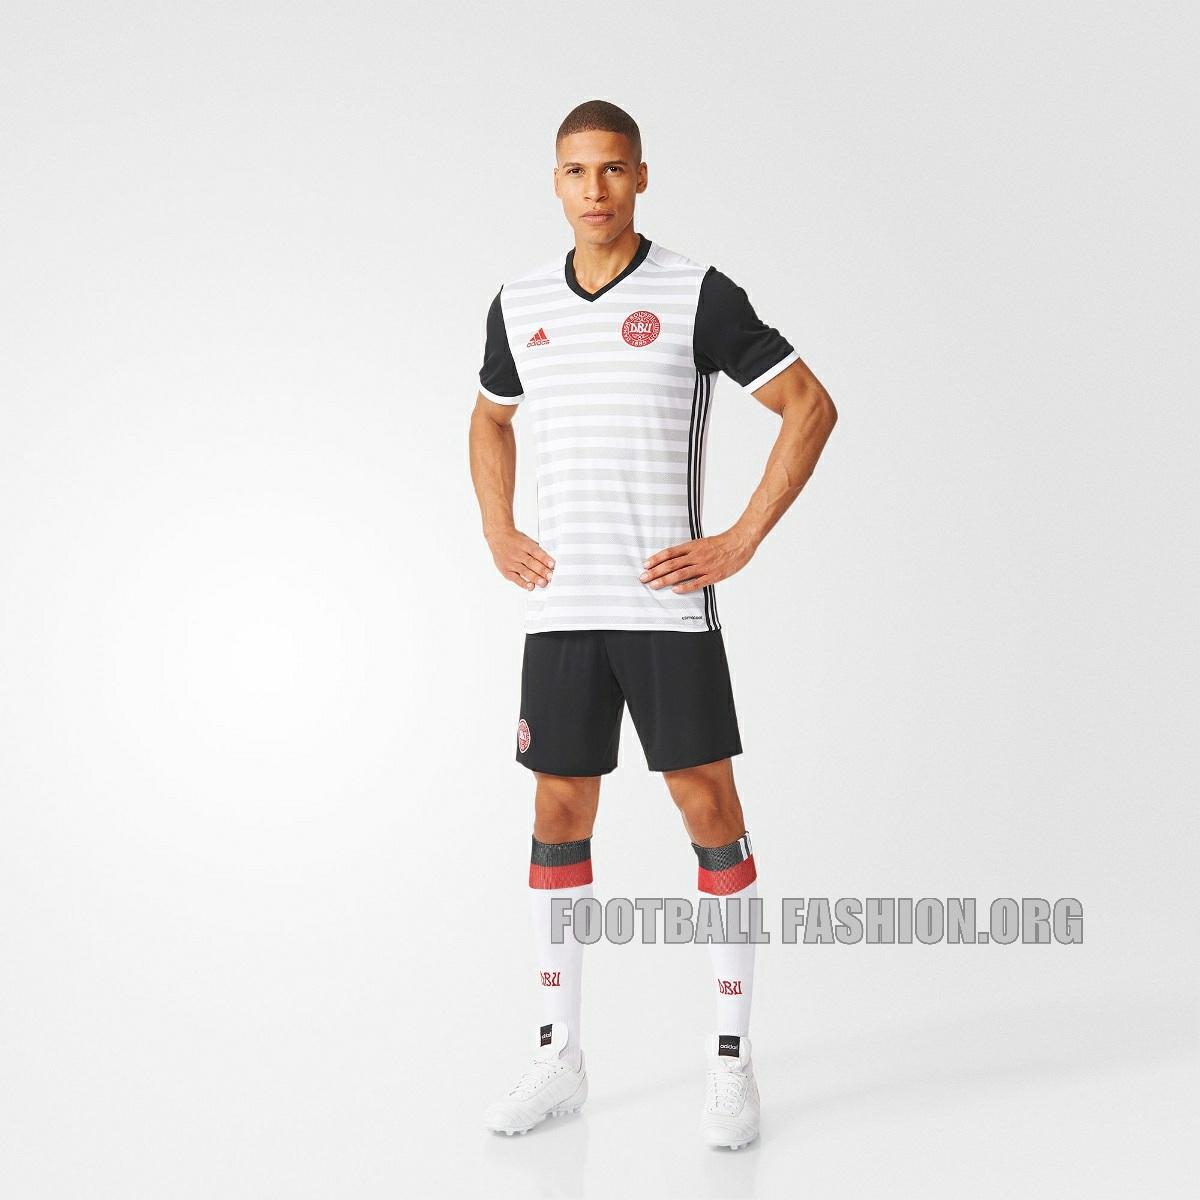 3123d7695af Denmark 2016 17 adidas Away Kit - FOOTBALL FASHION.ORG